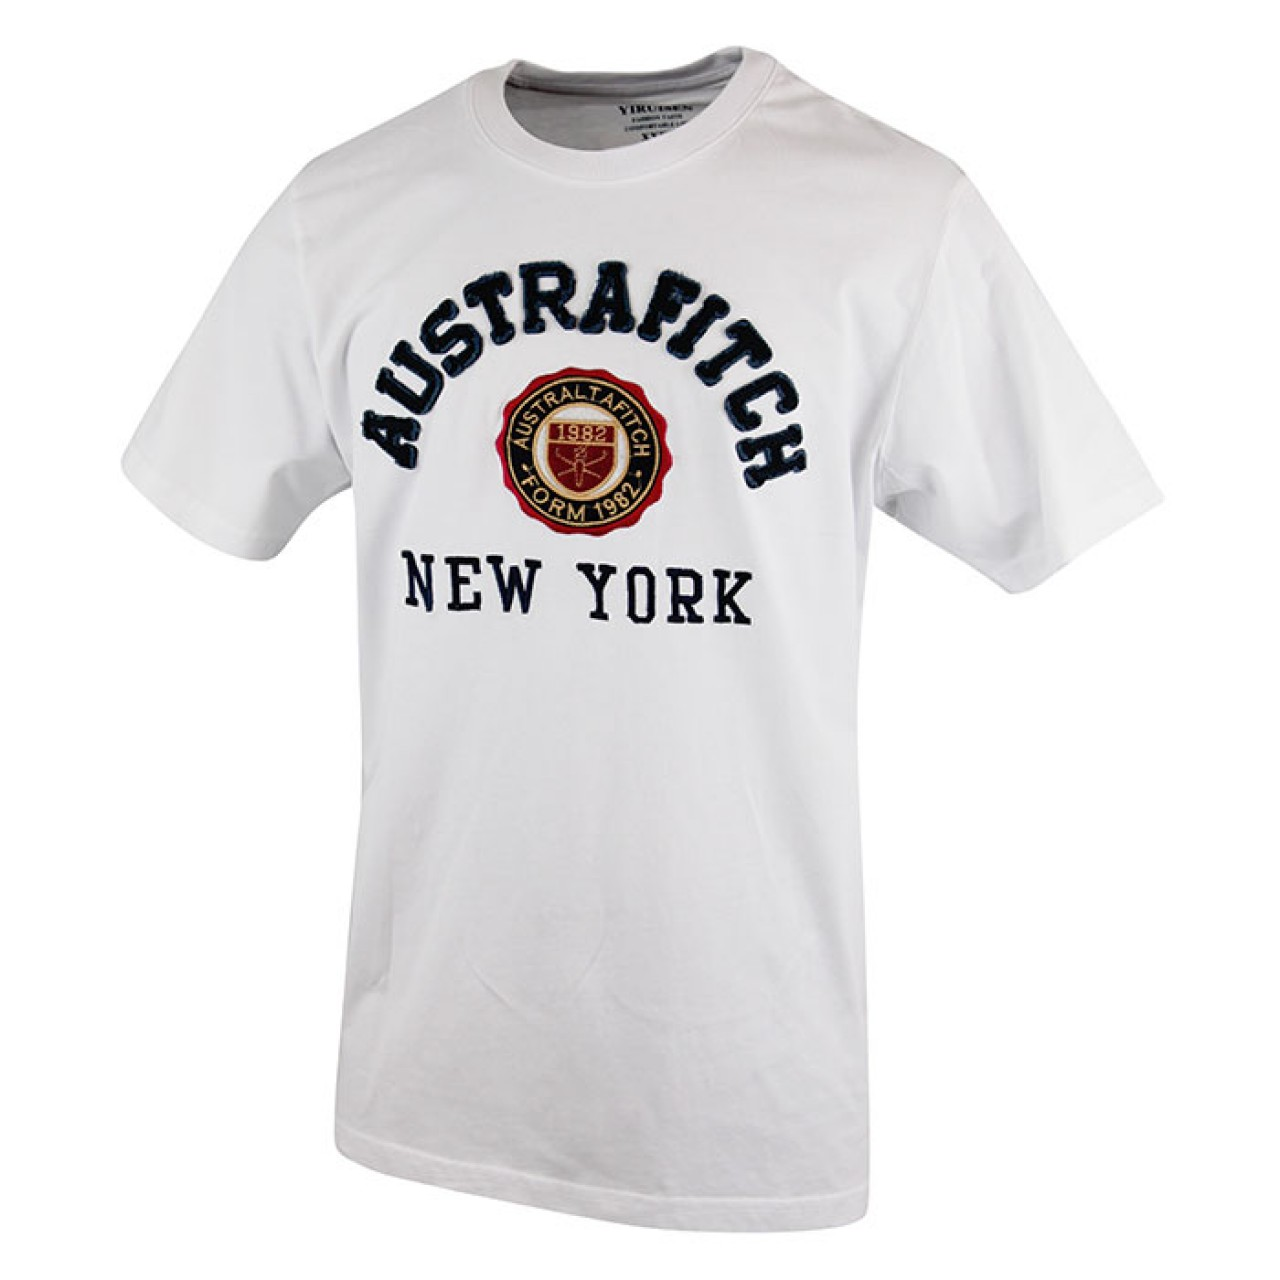 Men's AUSTRA-FITCH White Crew Neck T-shirt